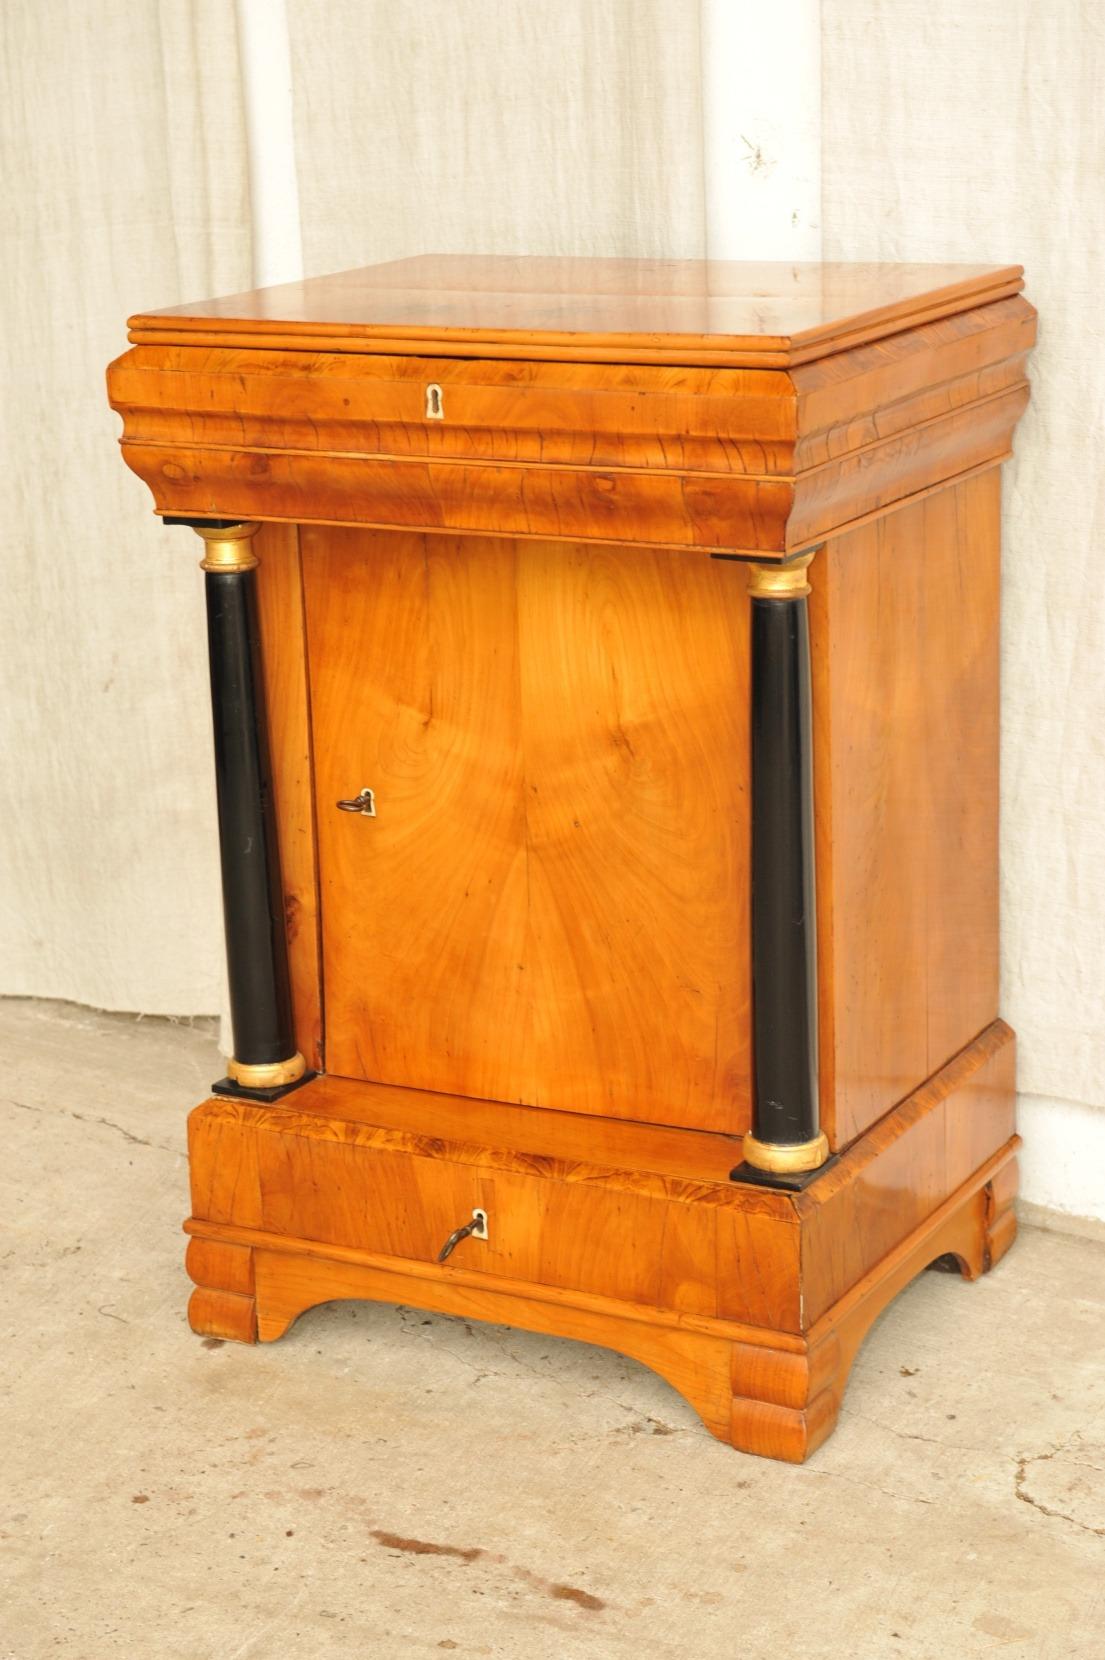 Galerie (verkaufte Möbel) | Produktkategorien | Antik im Hof